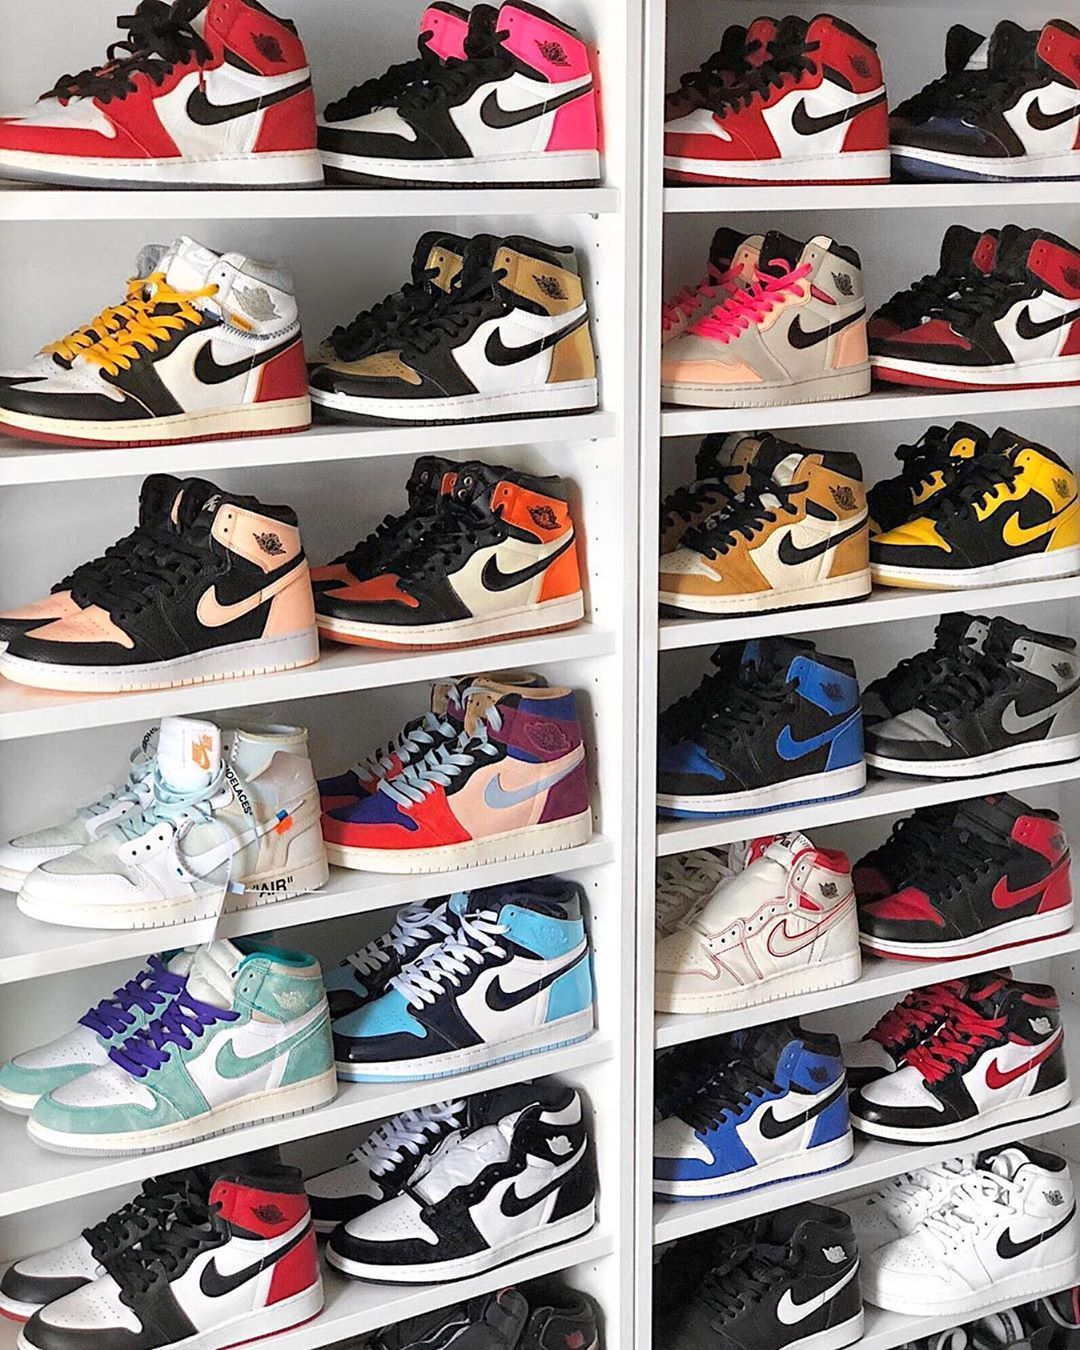 chaussure nike air jordan femme